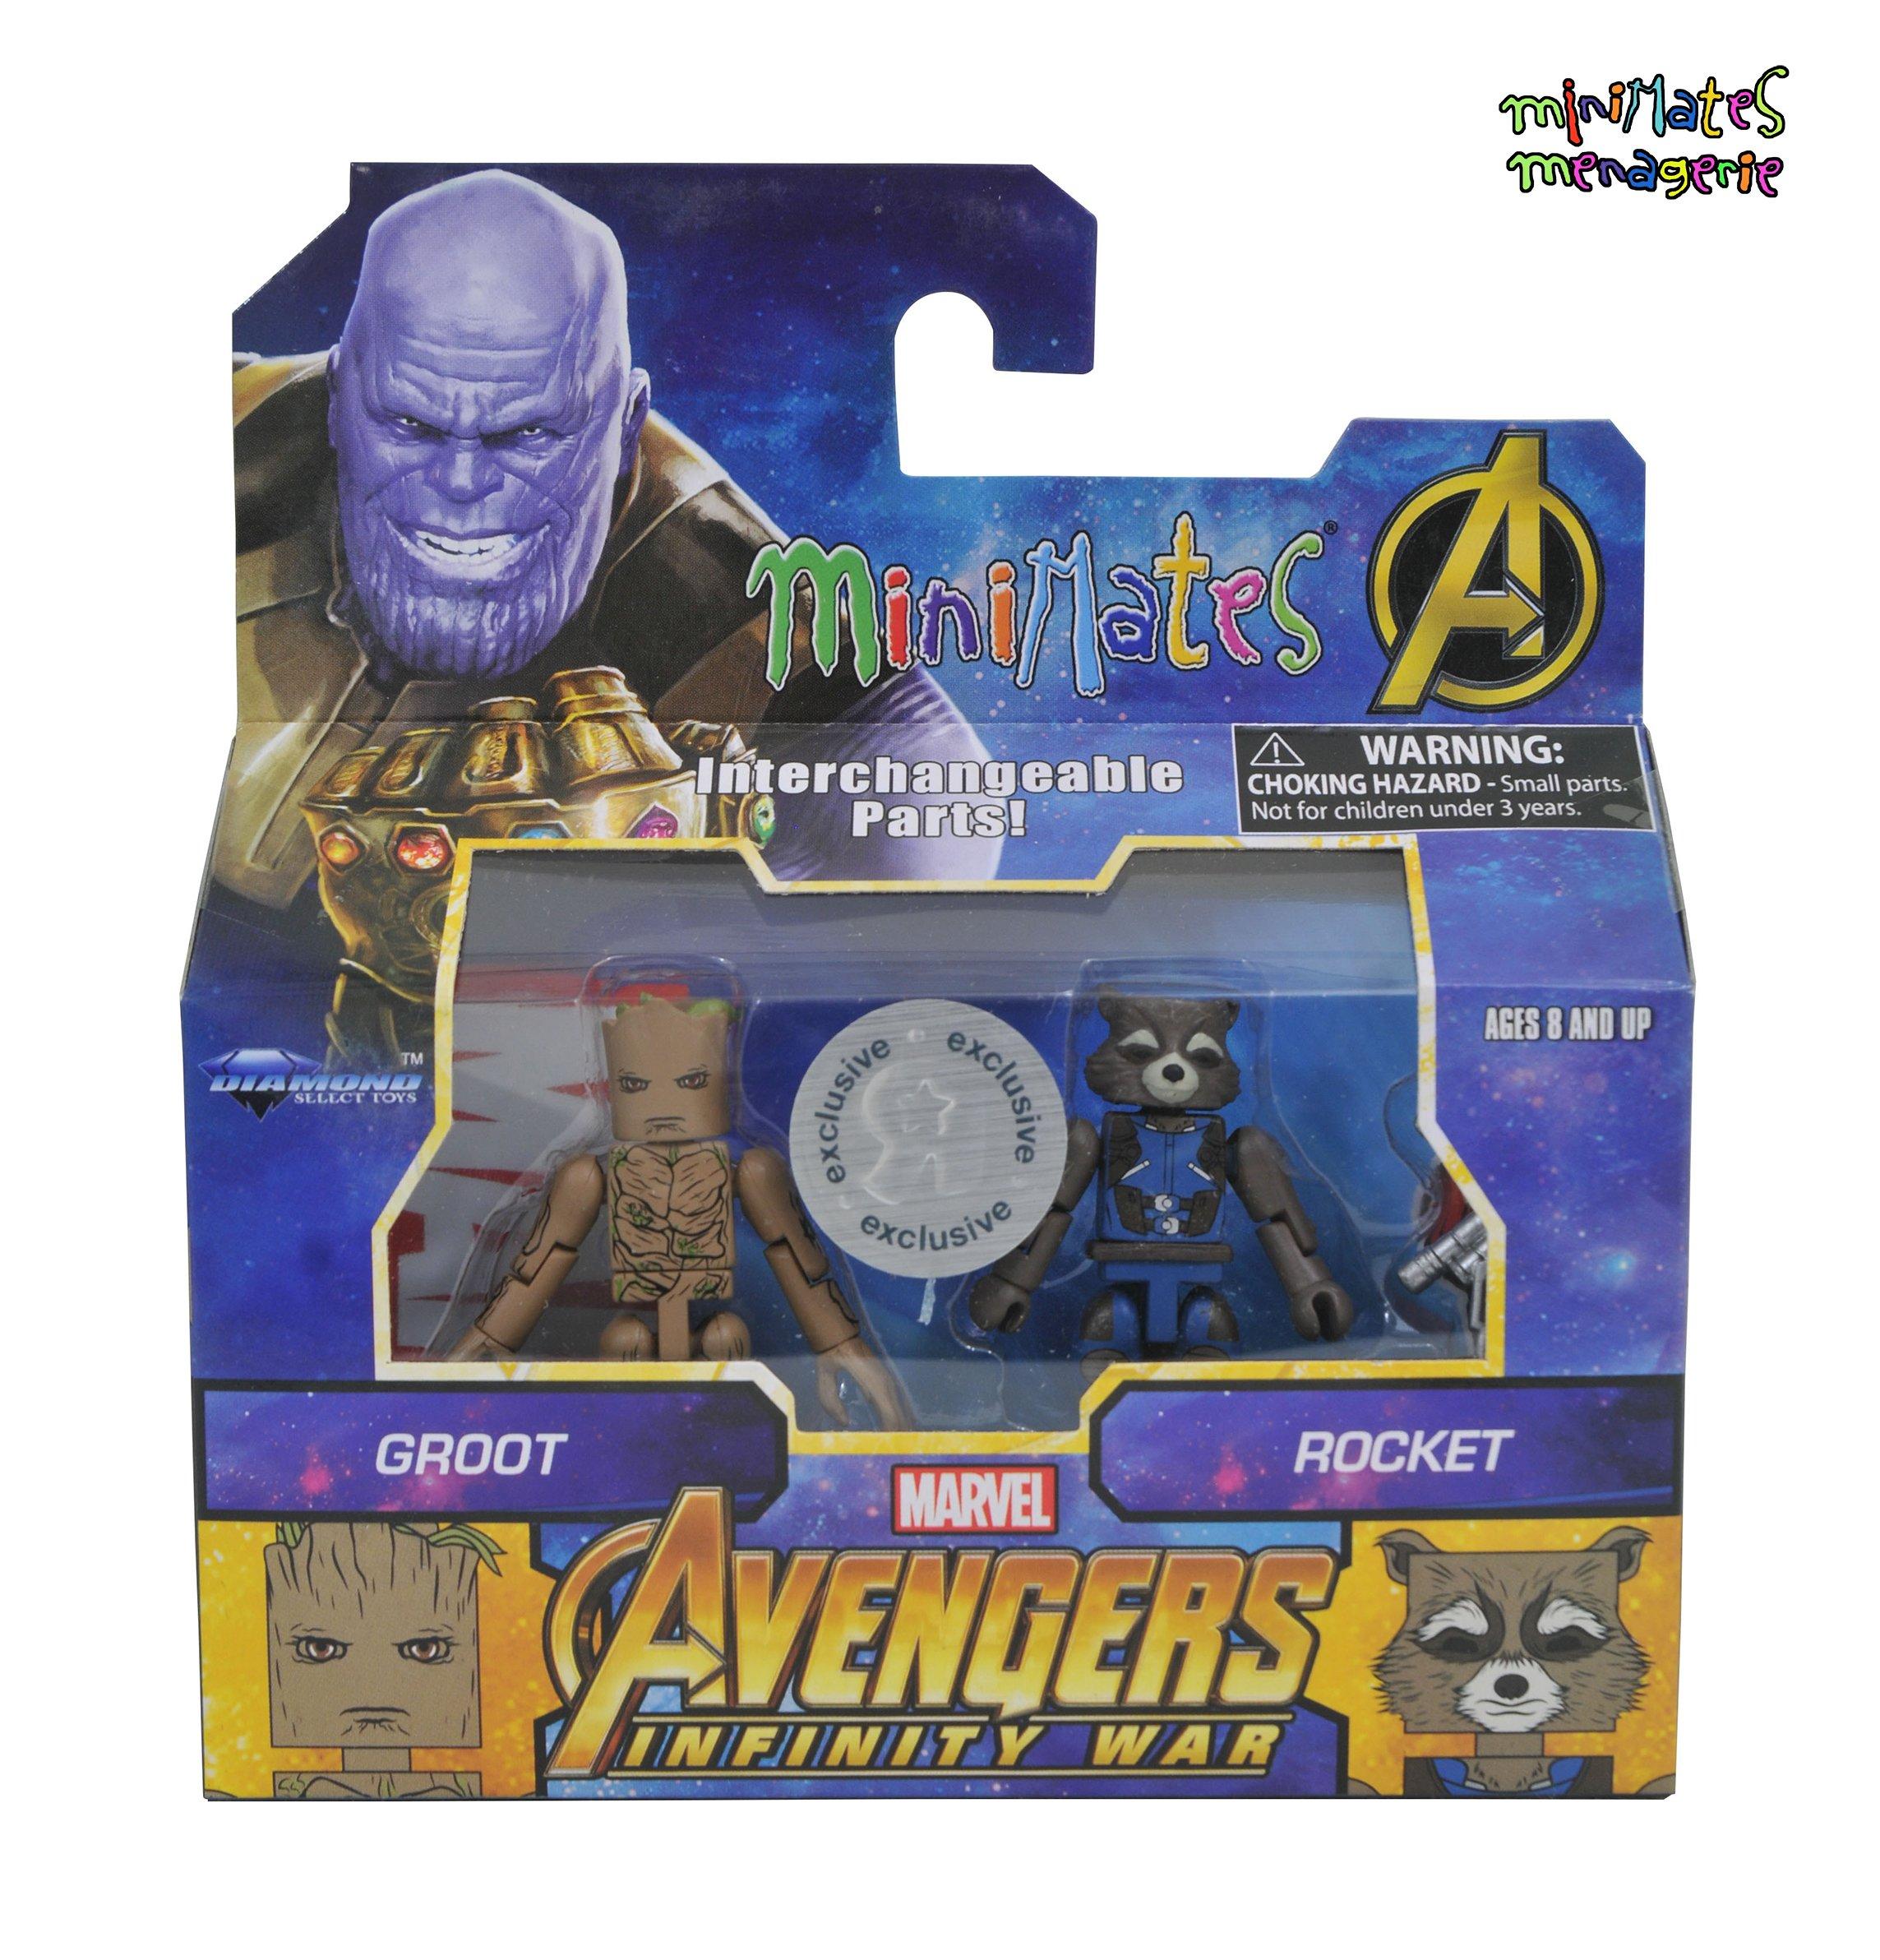 Marvel Minimates Toys R Us Avengers Infinity War Movie Wave 1 Rocket Raccoon